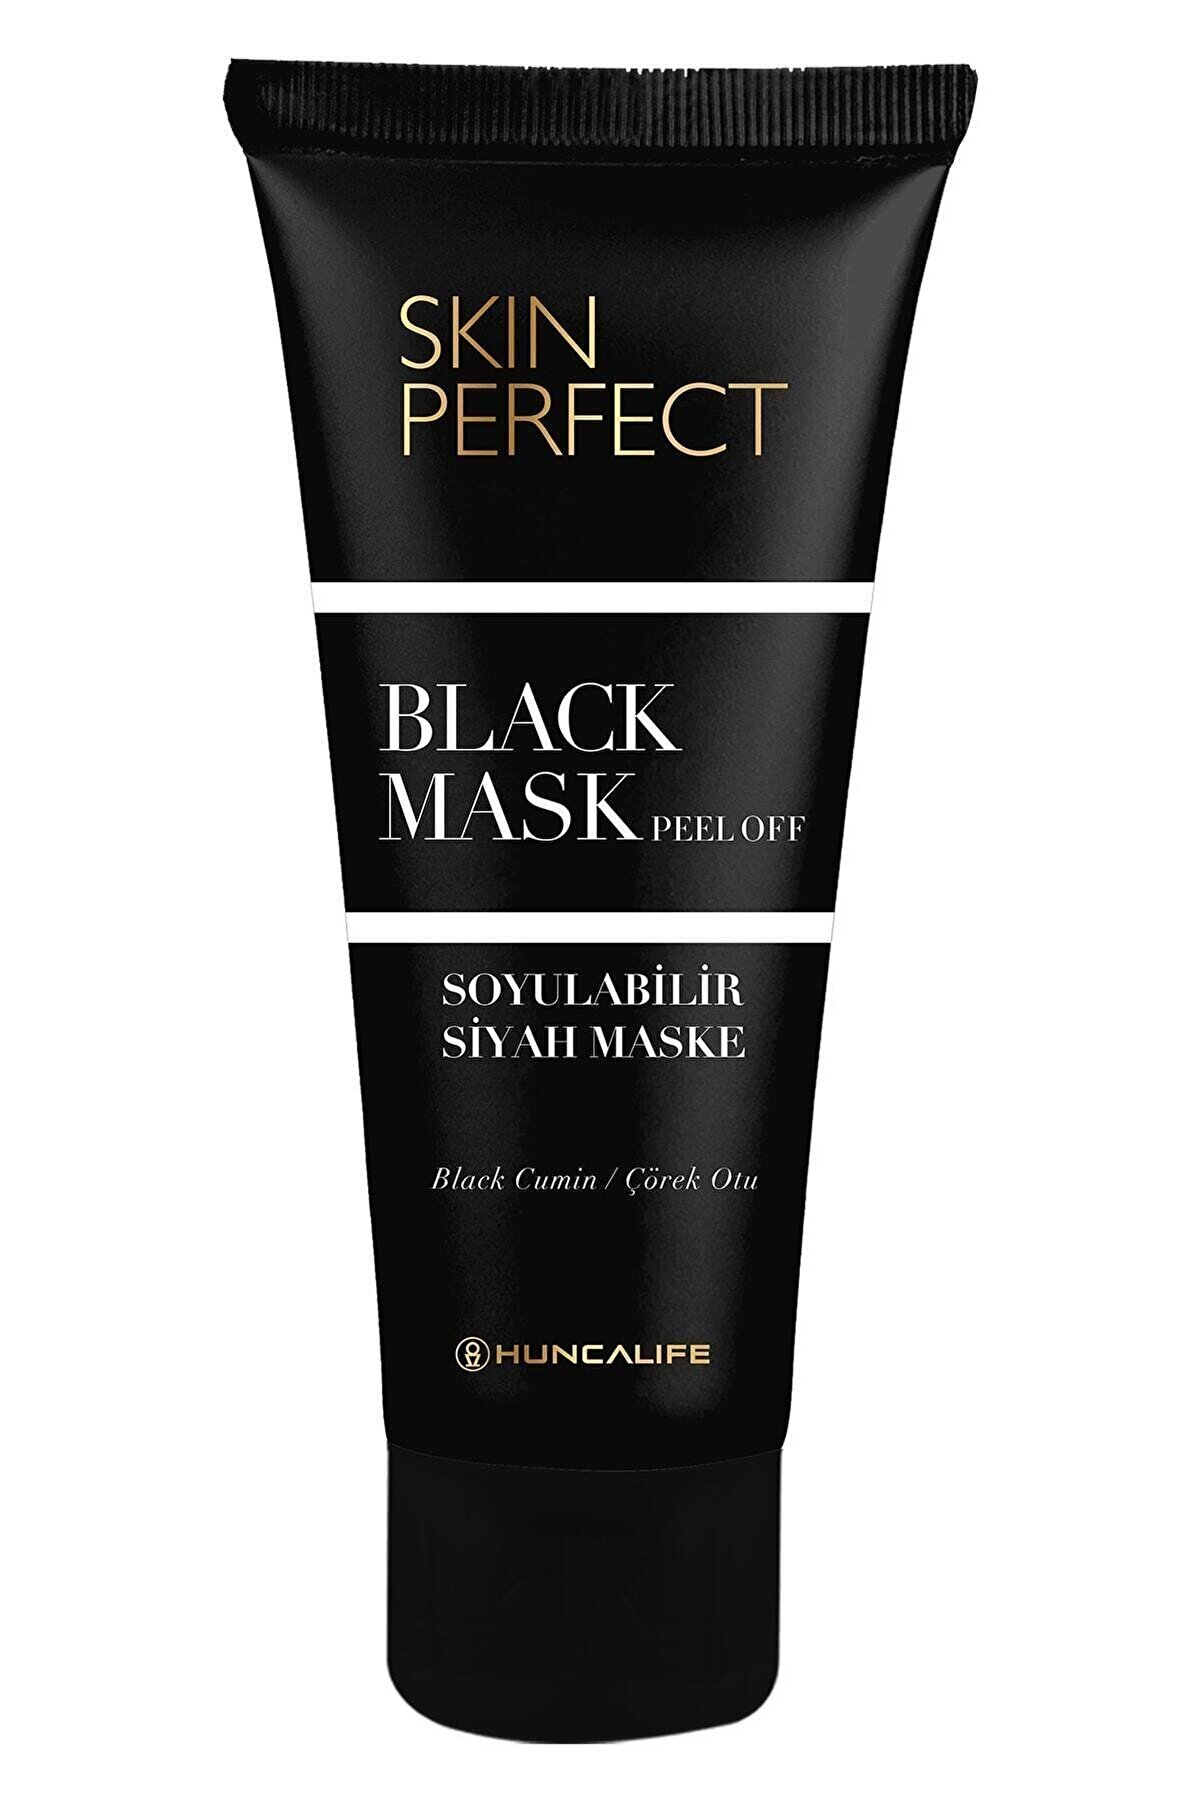 Hunca Siyah Maske Skin Perfect Black Mask 100 ml